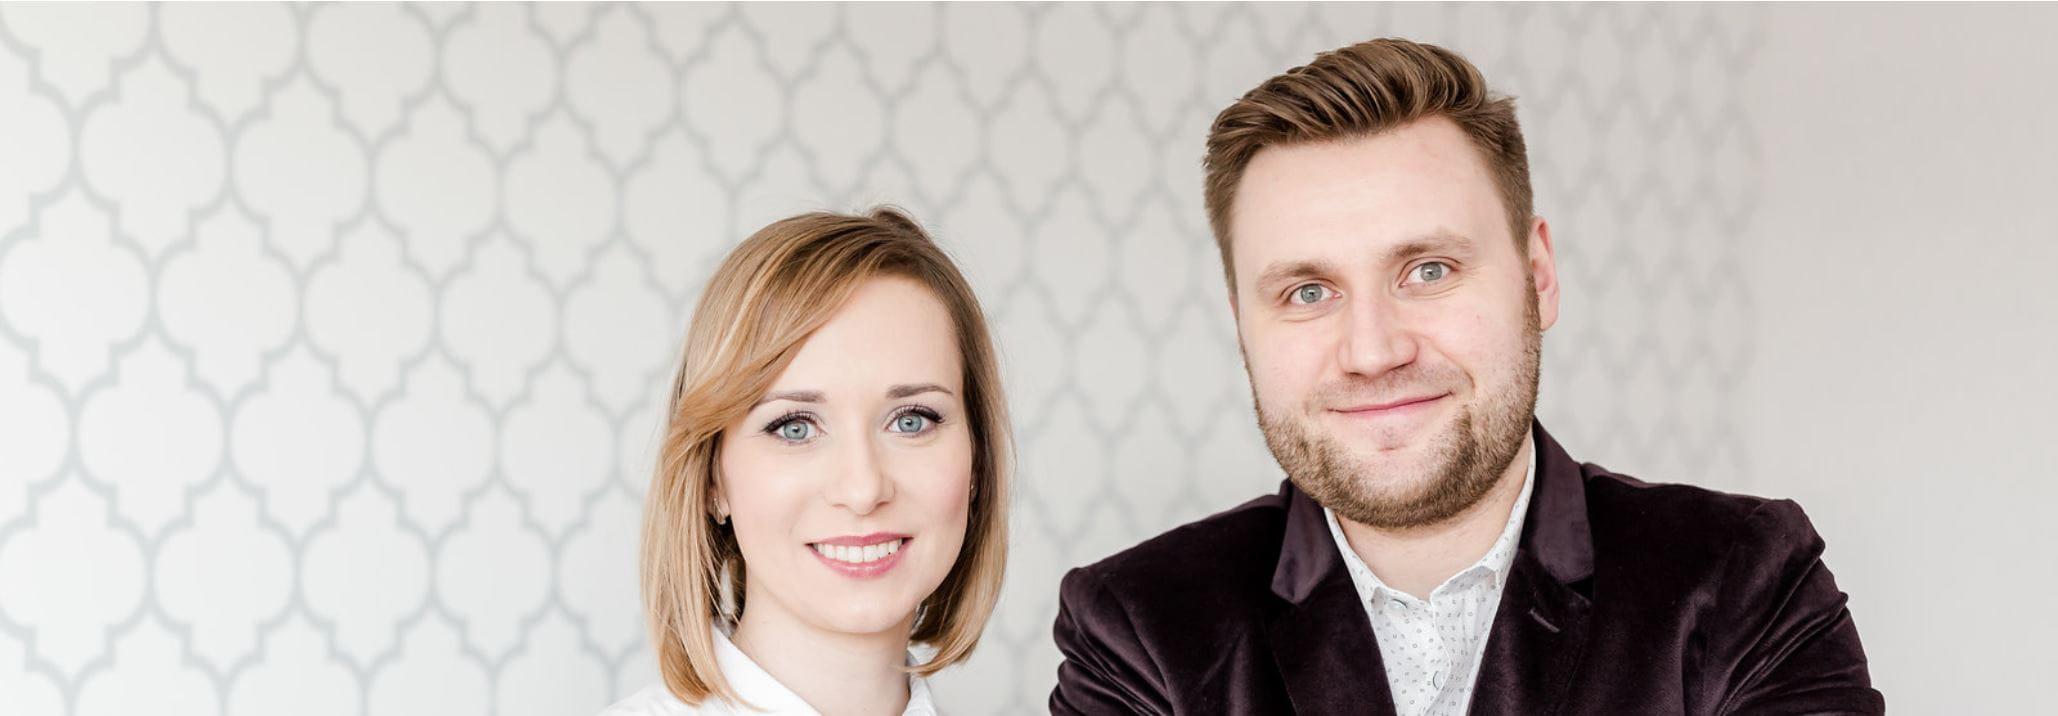 Kurs Konsultant Slubny Wedding Planner